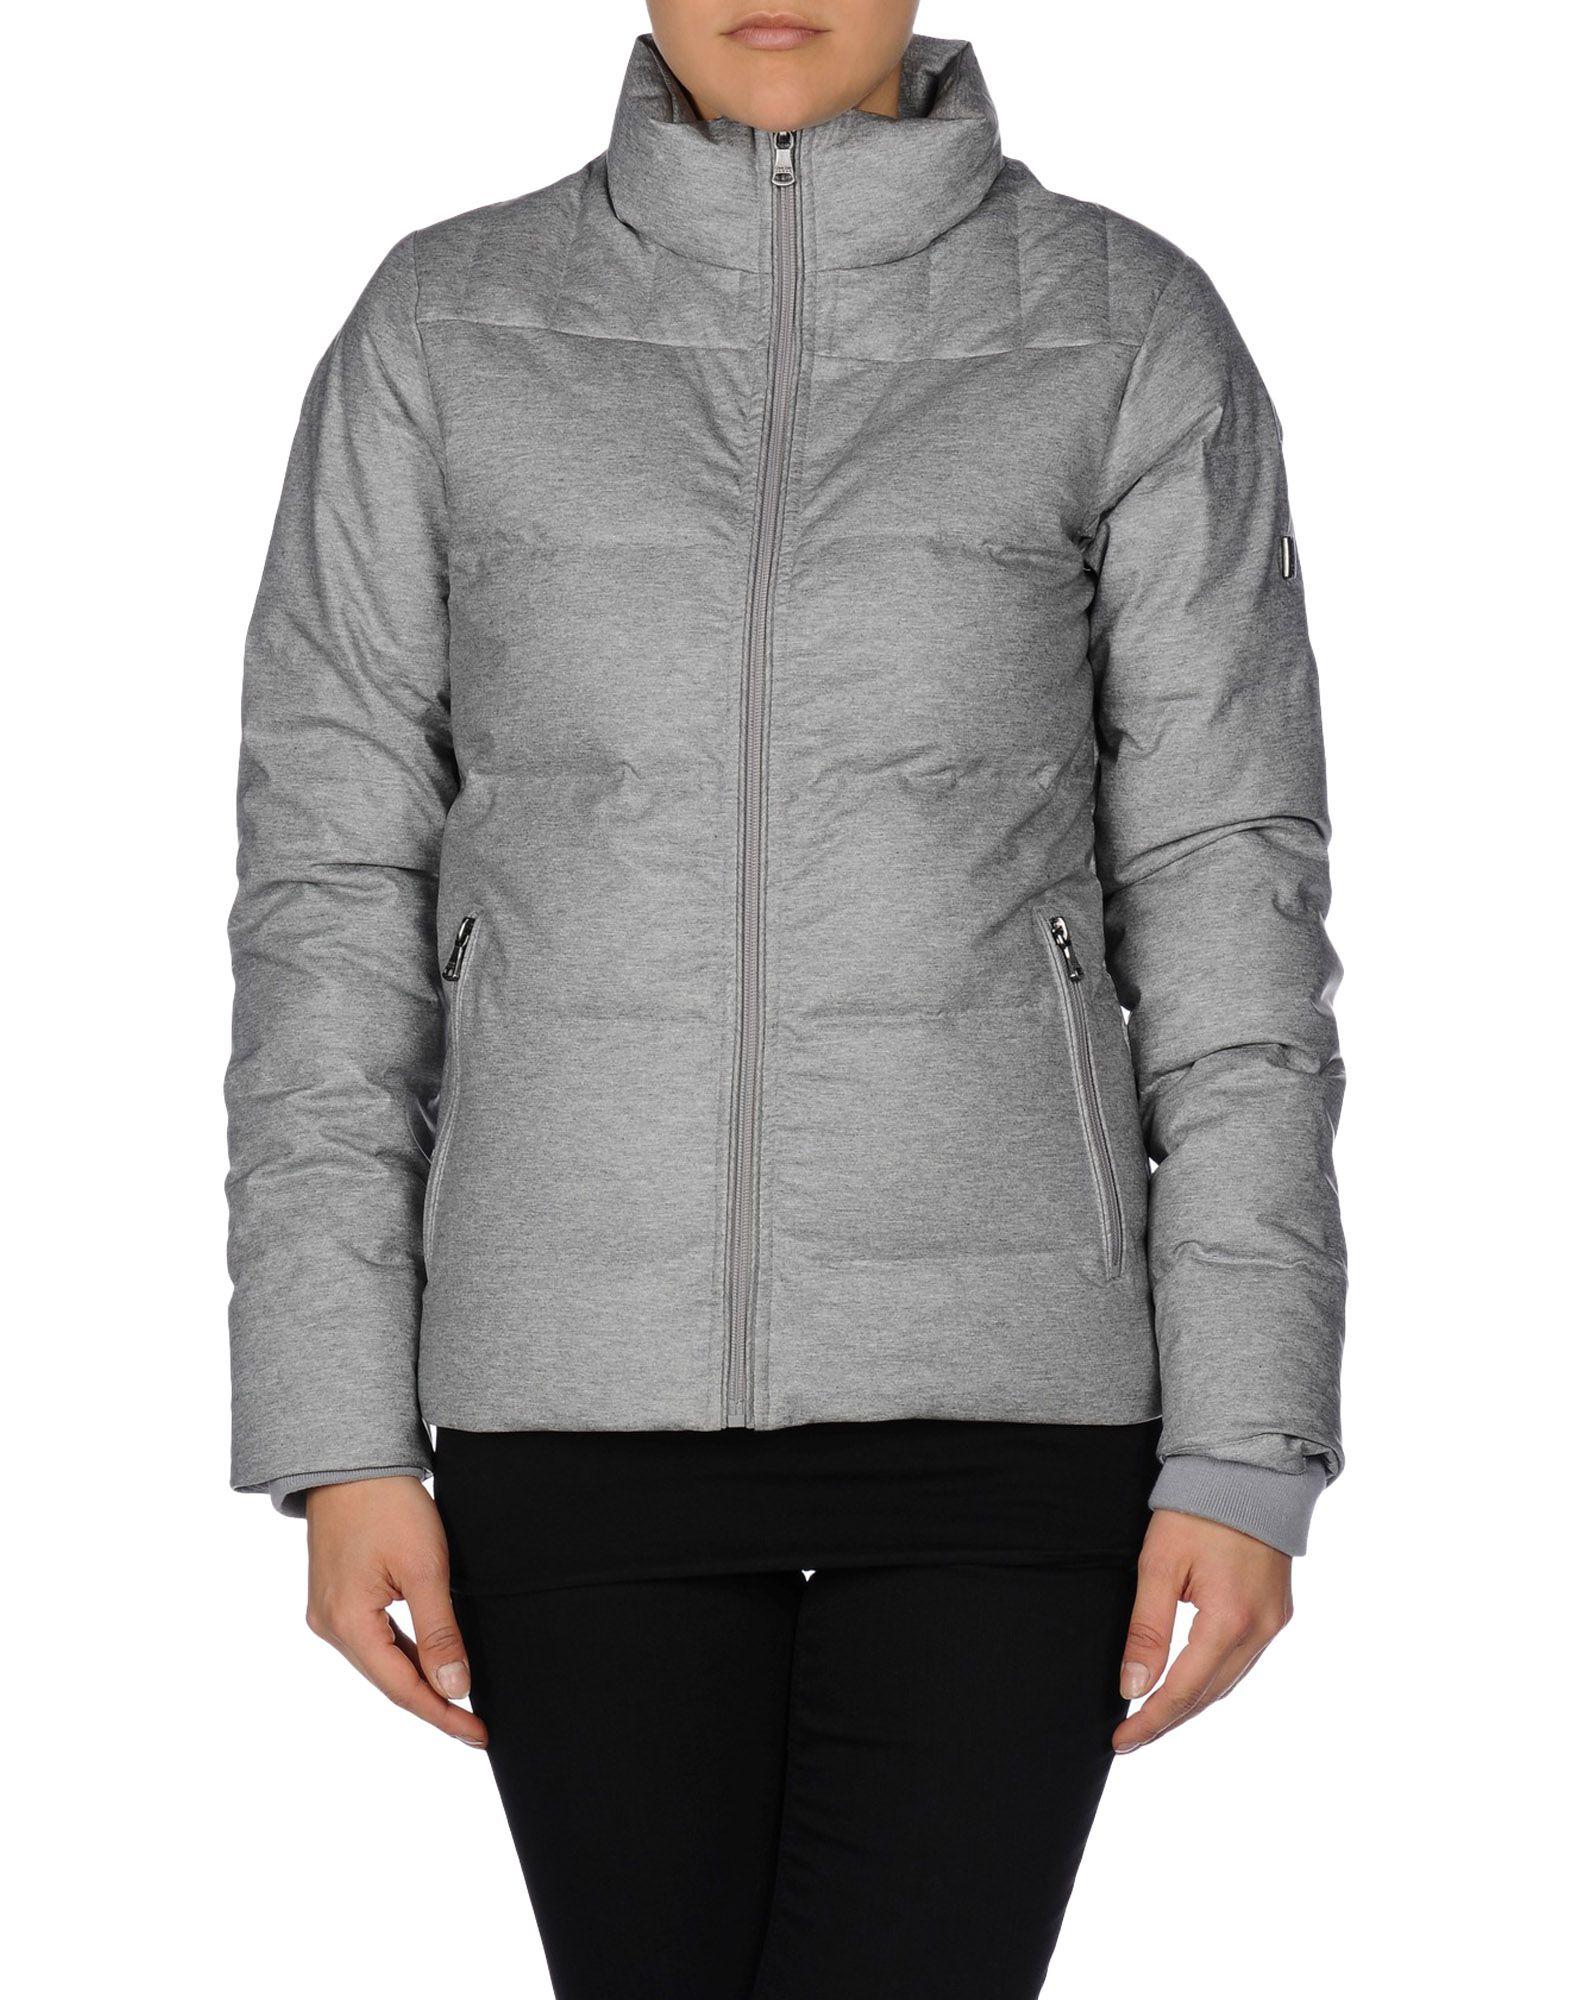 Lyst - Calvin Klein Jeans Down Jacket in Gray